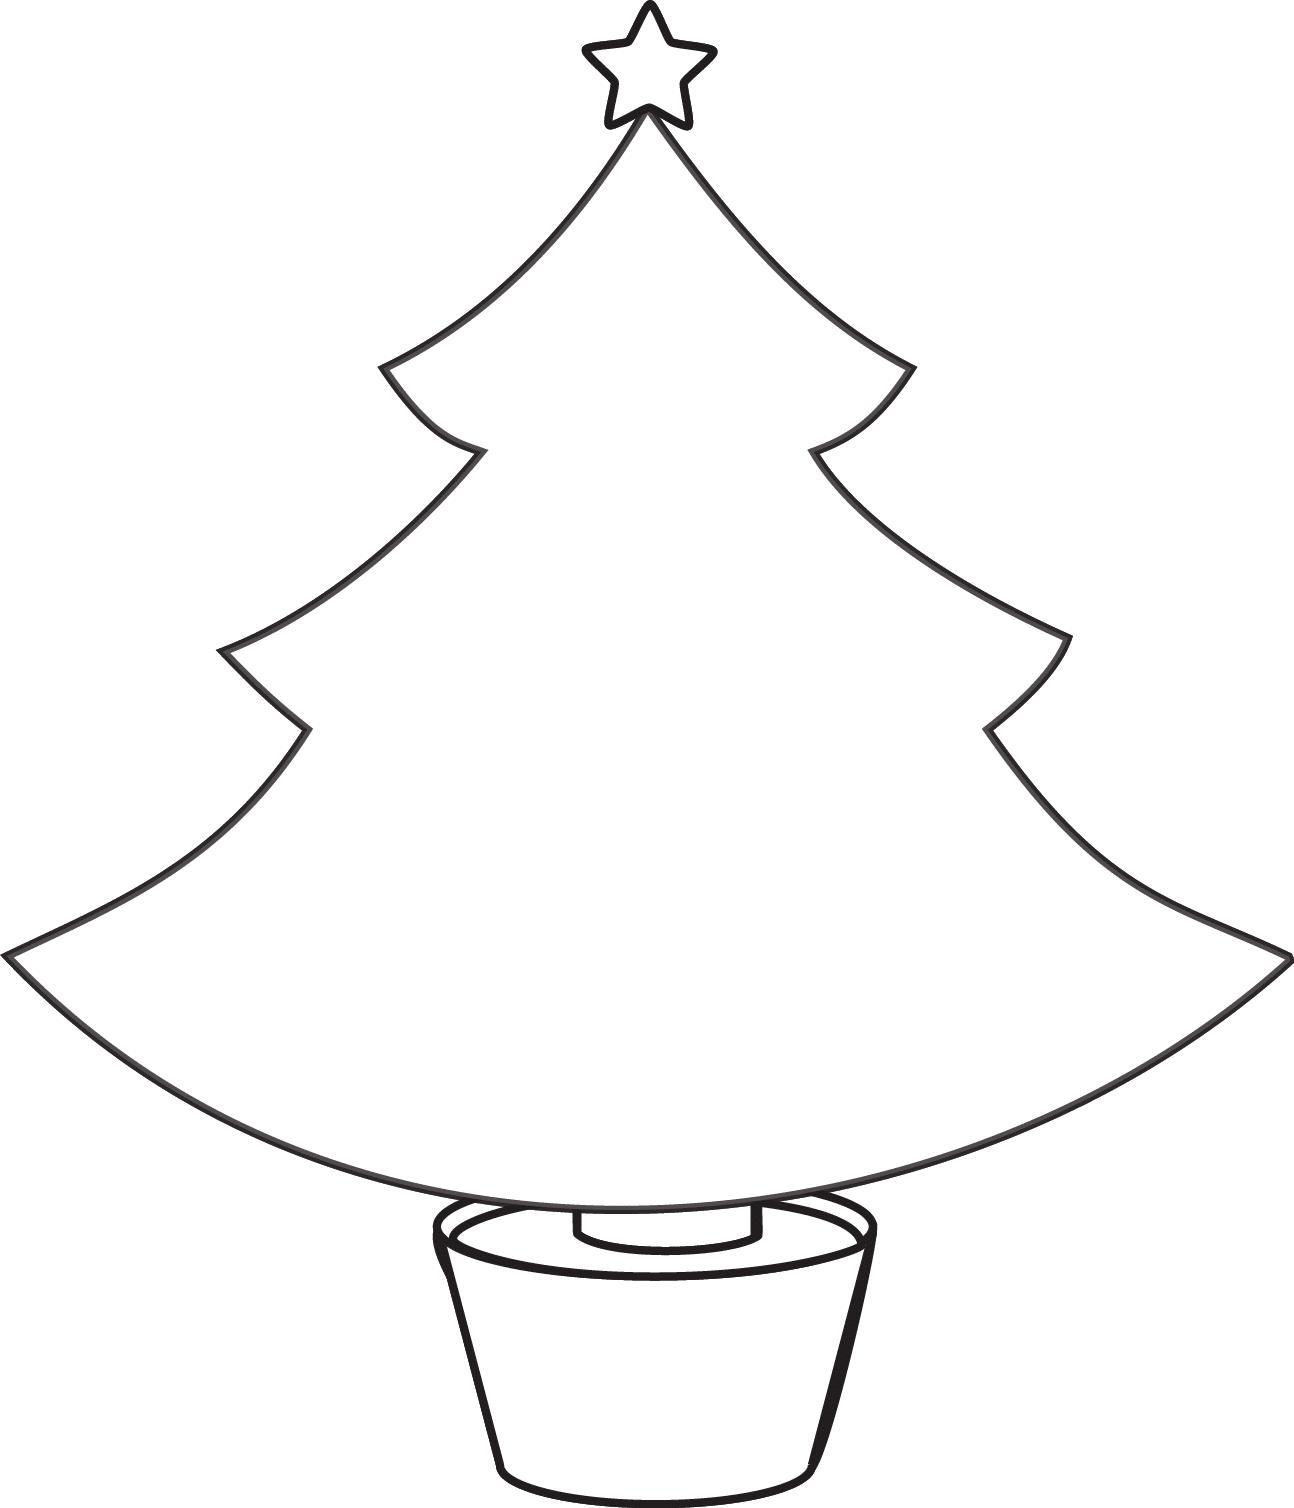 Weihnachtsbaum Vorlagen 18 Weihnachtsbaum Vorlage Tannenbaum Vorlage Bunter Weihnachtsbaum